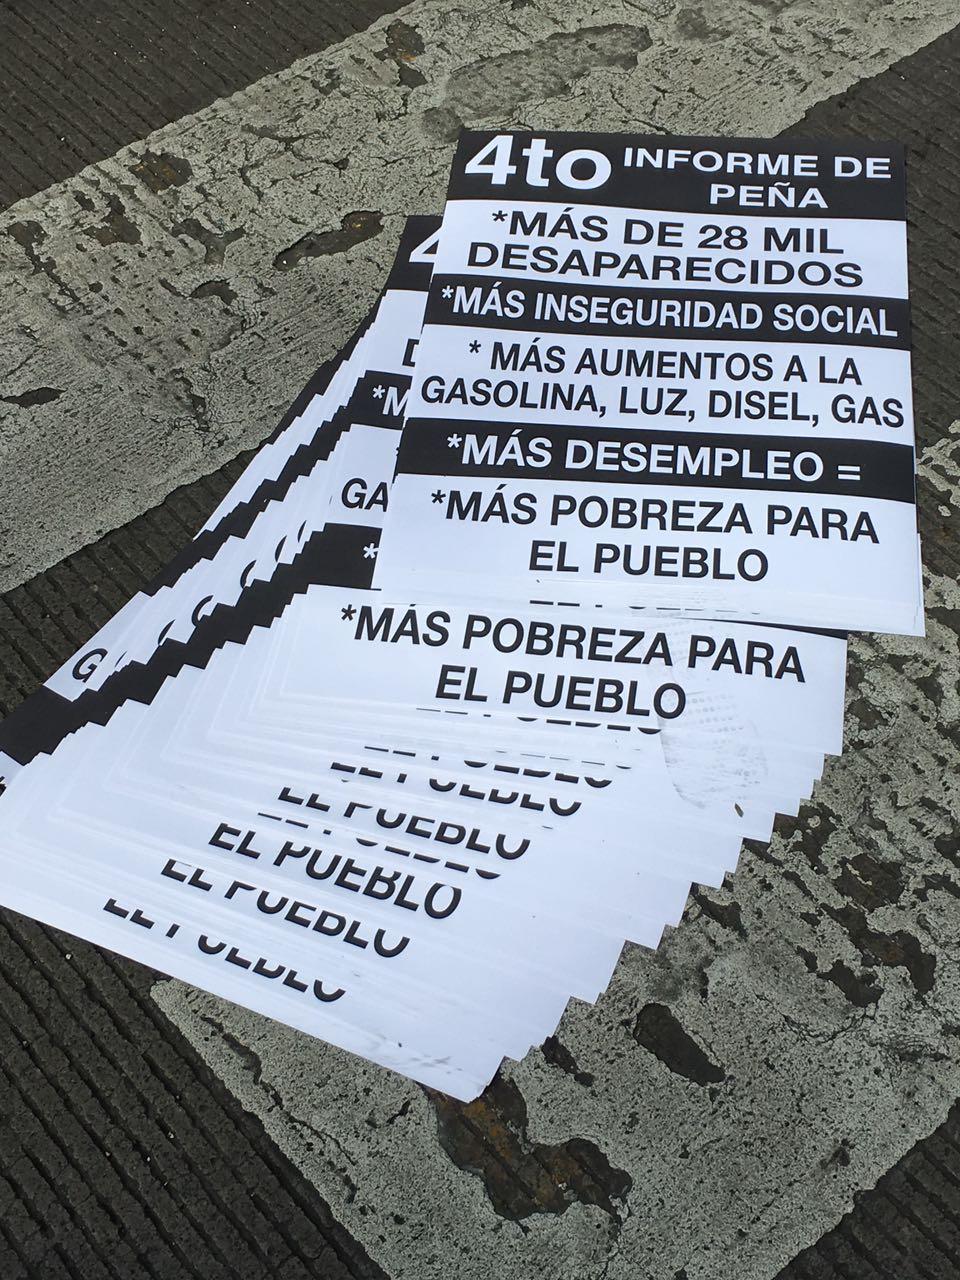 pena-nieto-renunciaya-presidente-marcha-manifestacion